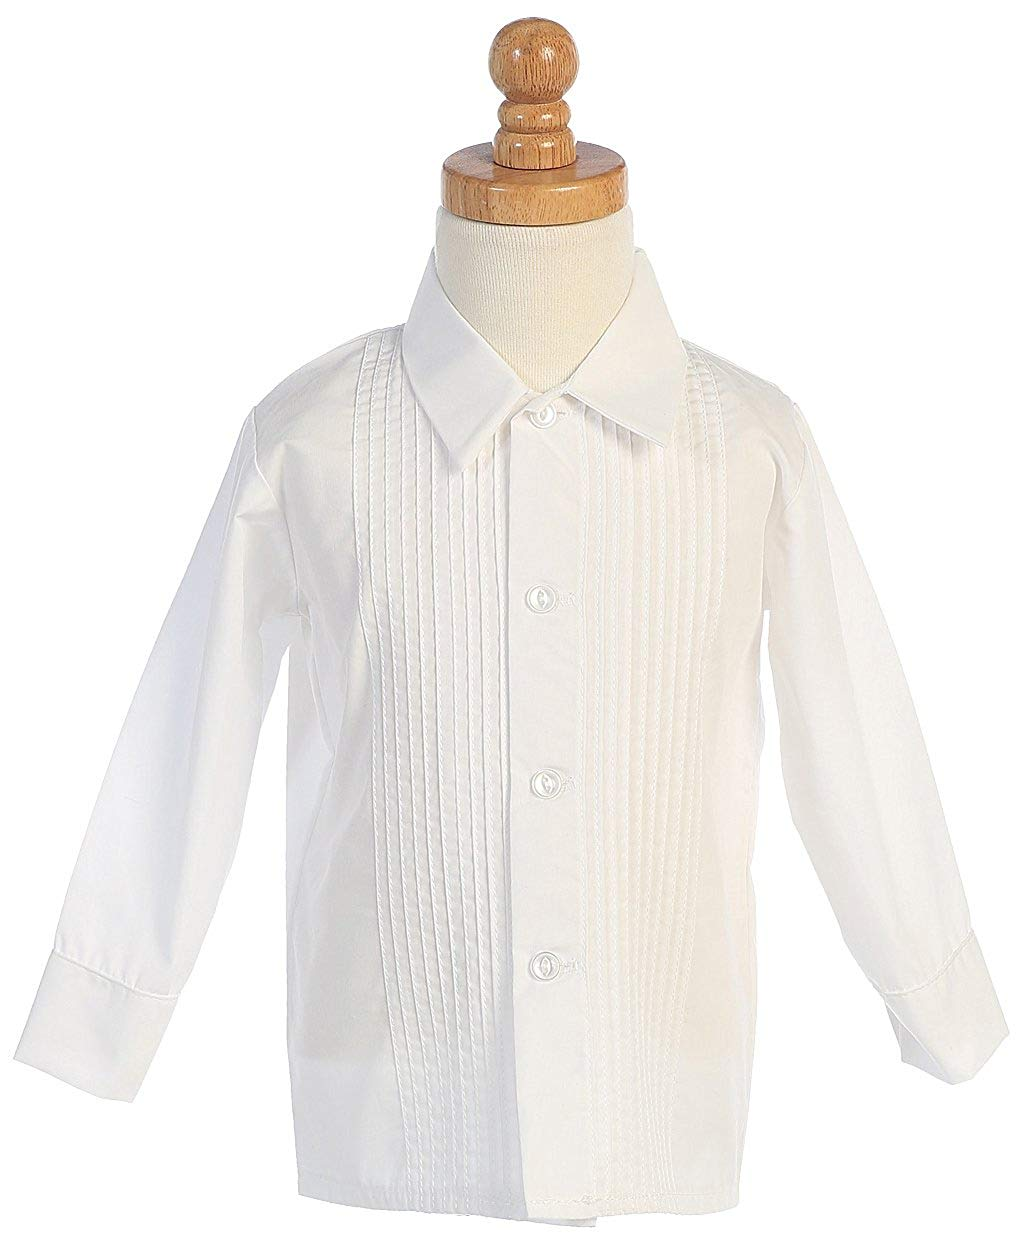 Boys White or Ivory Long Sleeve Pleat Child's Tuxedo Dress Shirt - Baby to Teen